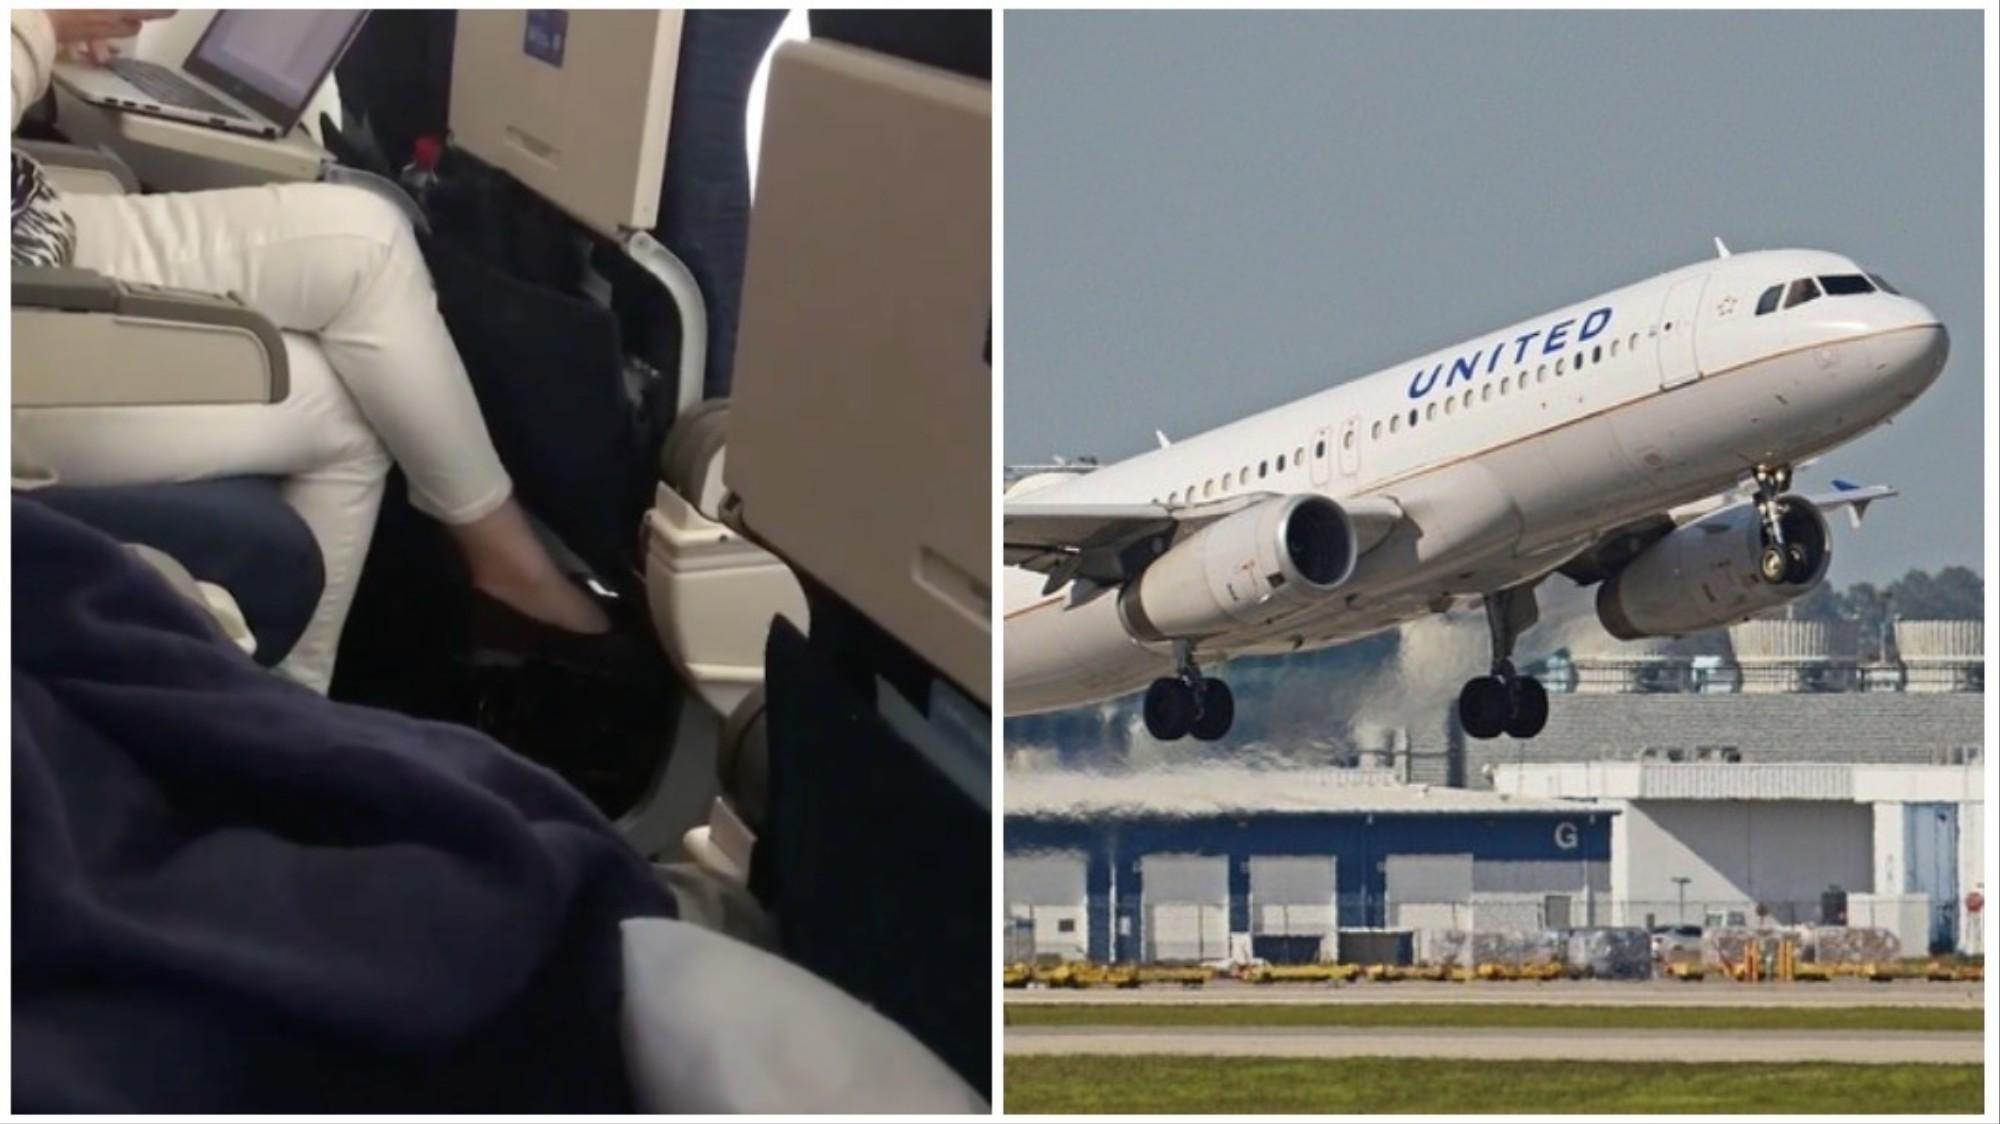 Woman Says Flight Crew Made 'Jokes' After a Man Masturbated Next to